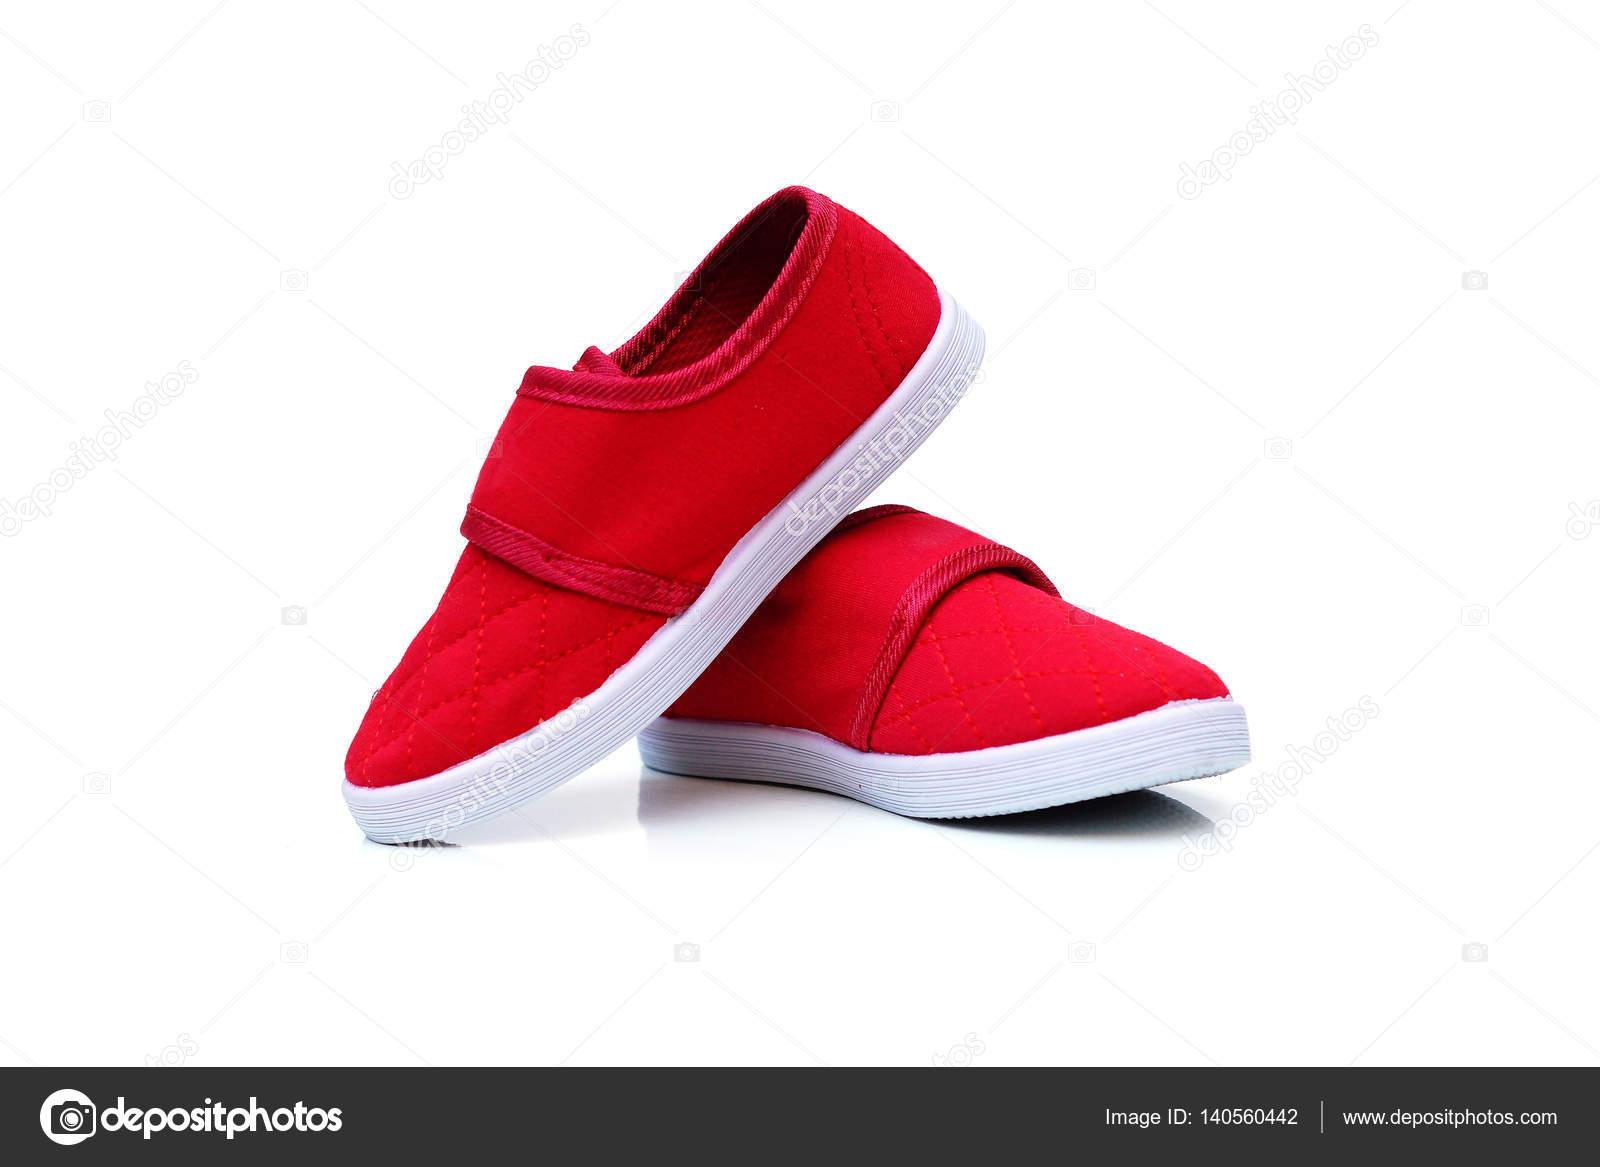 520b56cad13 Κόκκινο παντοφλέ παπούτσια — Φωτογραφία Αρχείου © weerapat #140560442